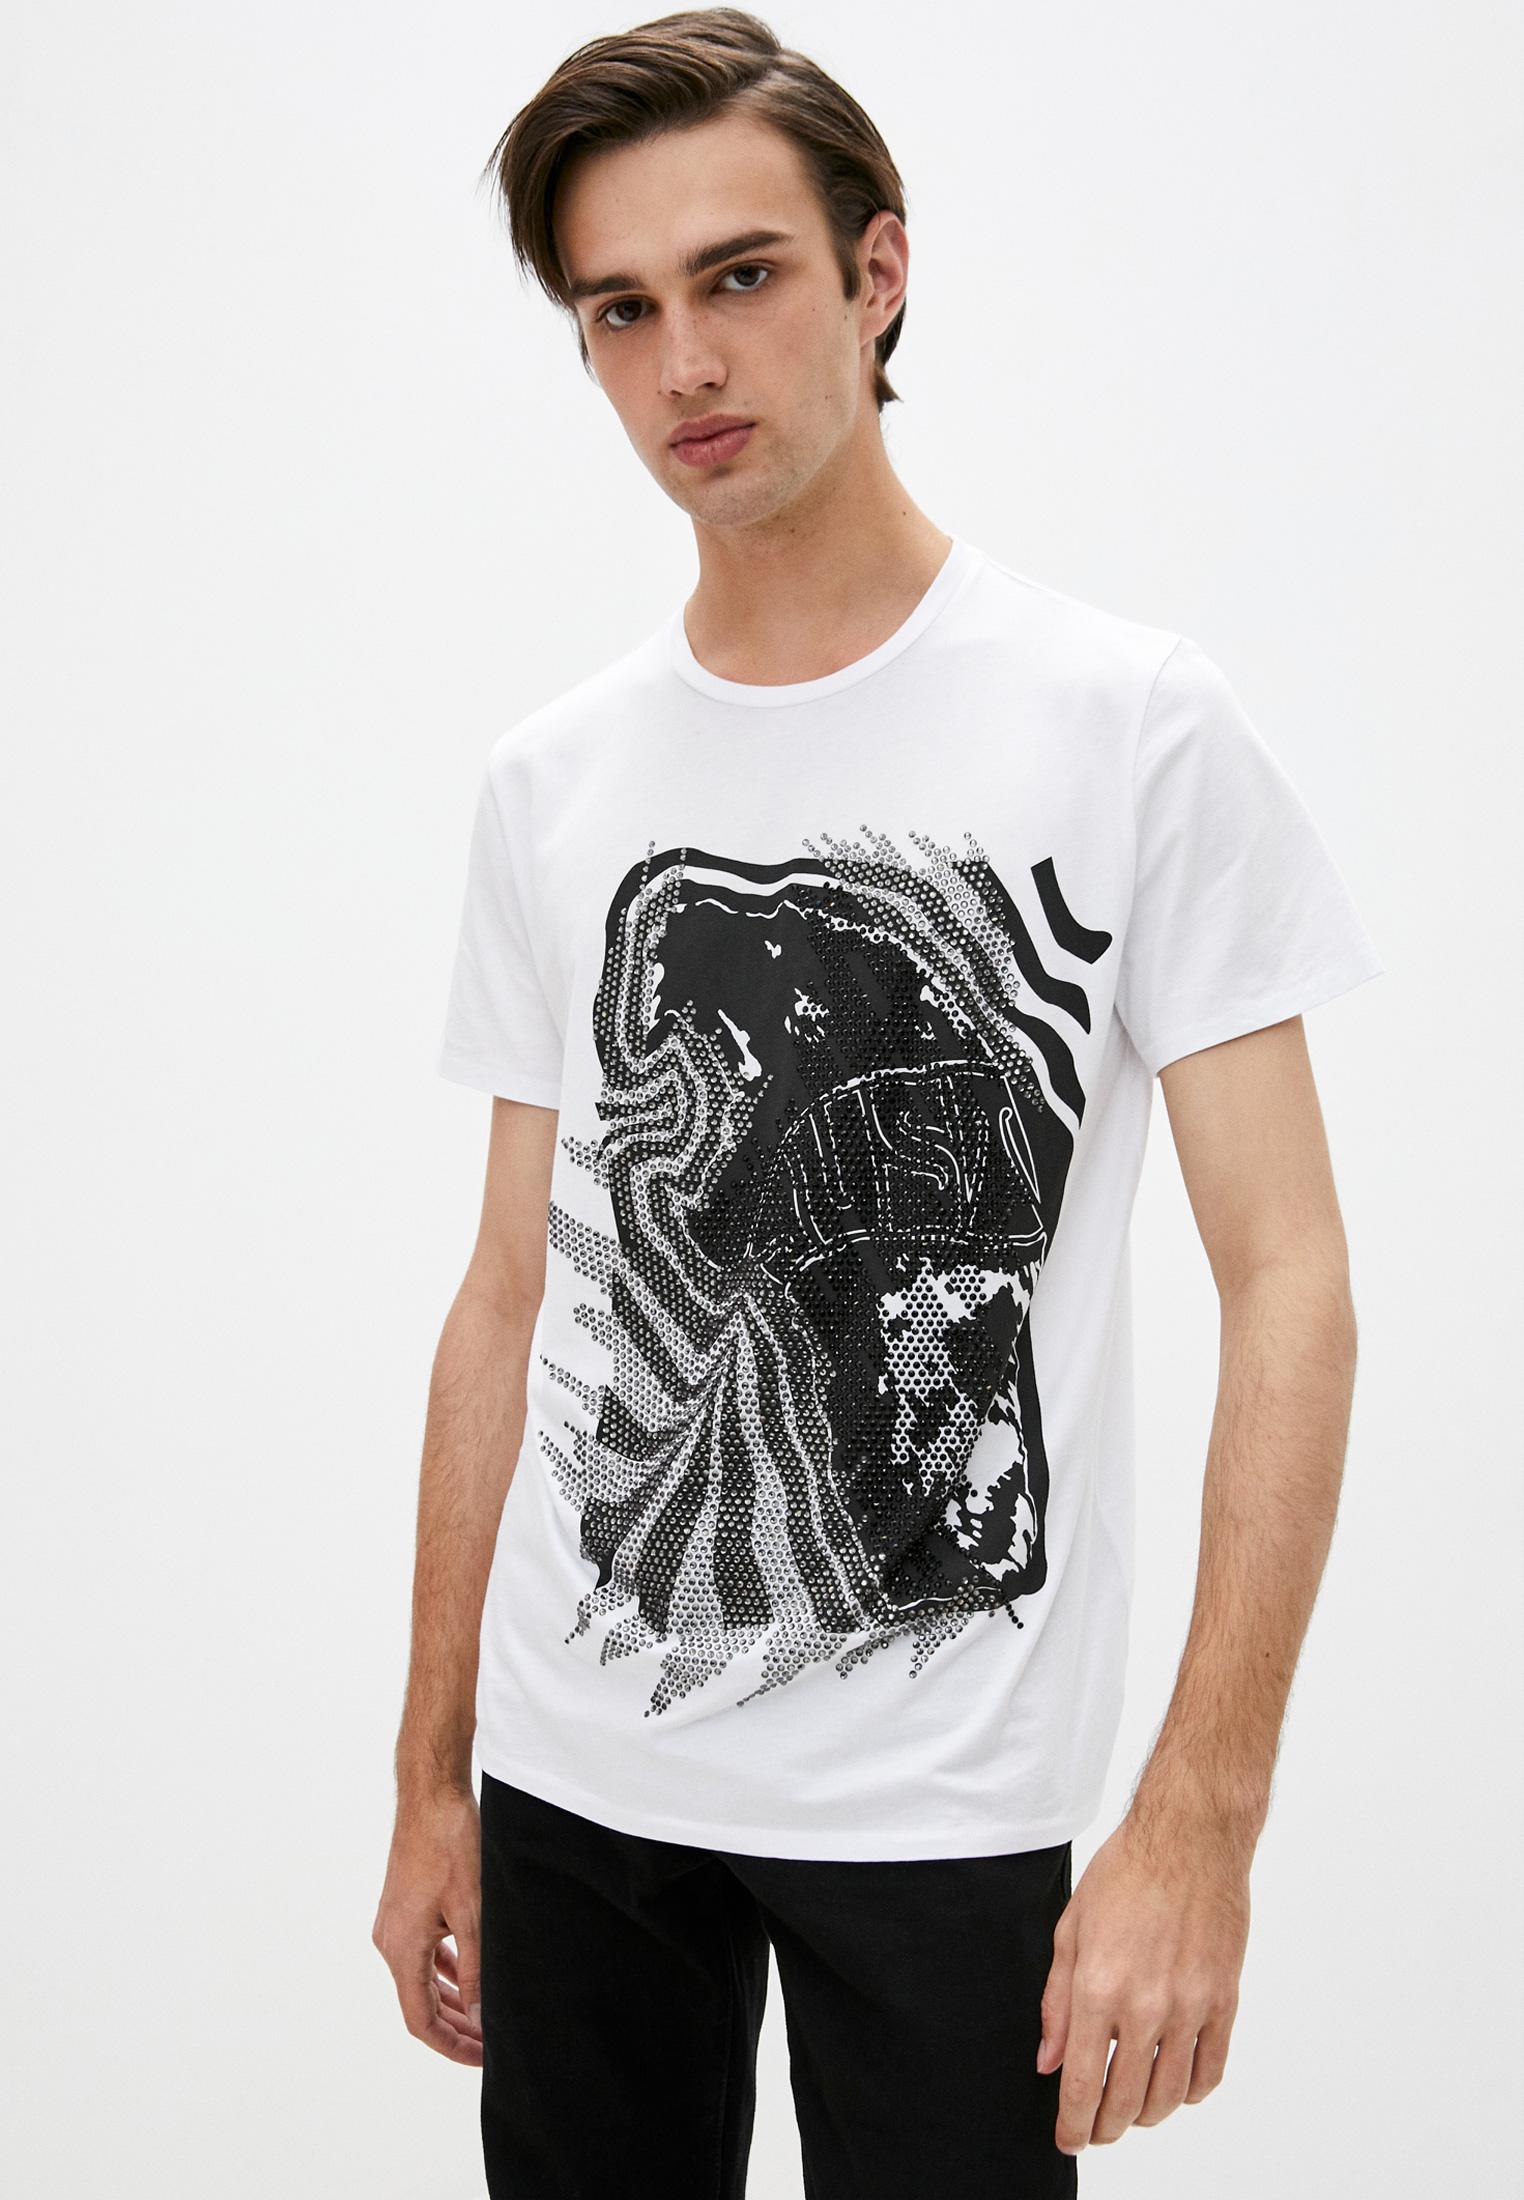 Мужская футболка Just Cavalli (Джаст Кавалли) S01GC0554 N20663